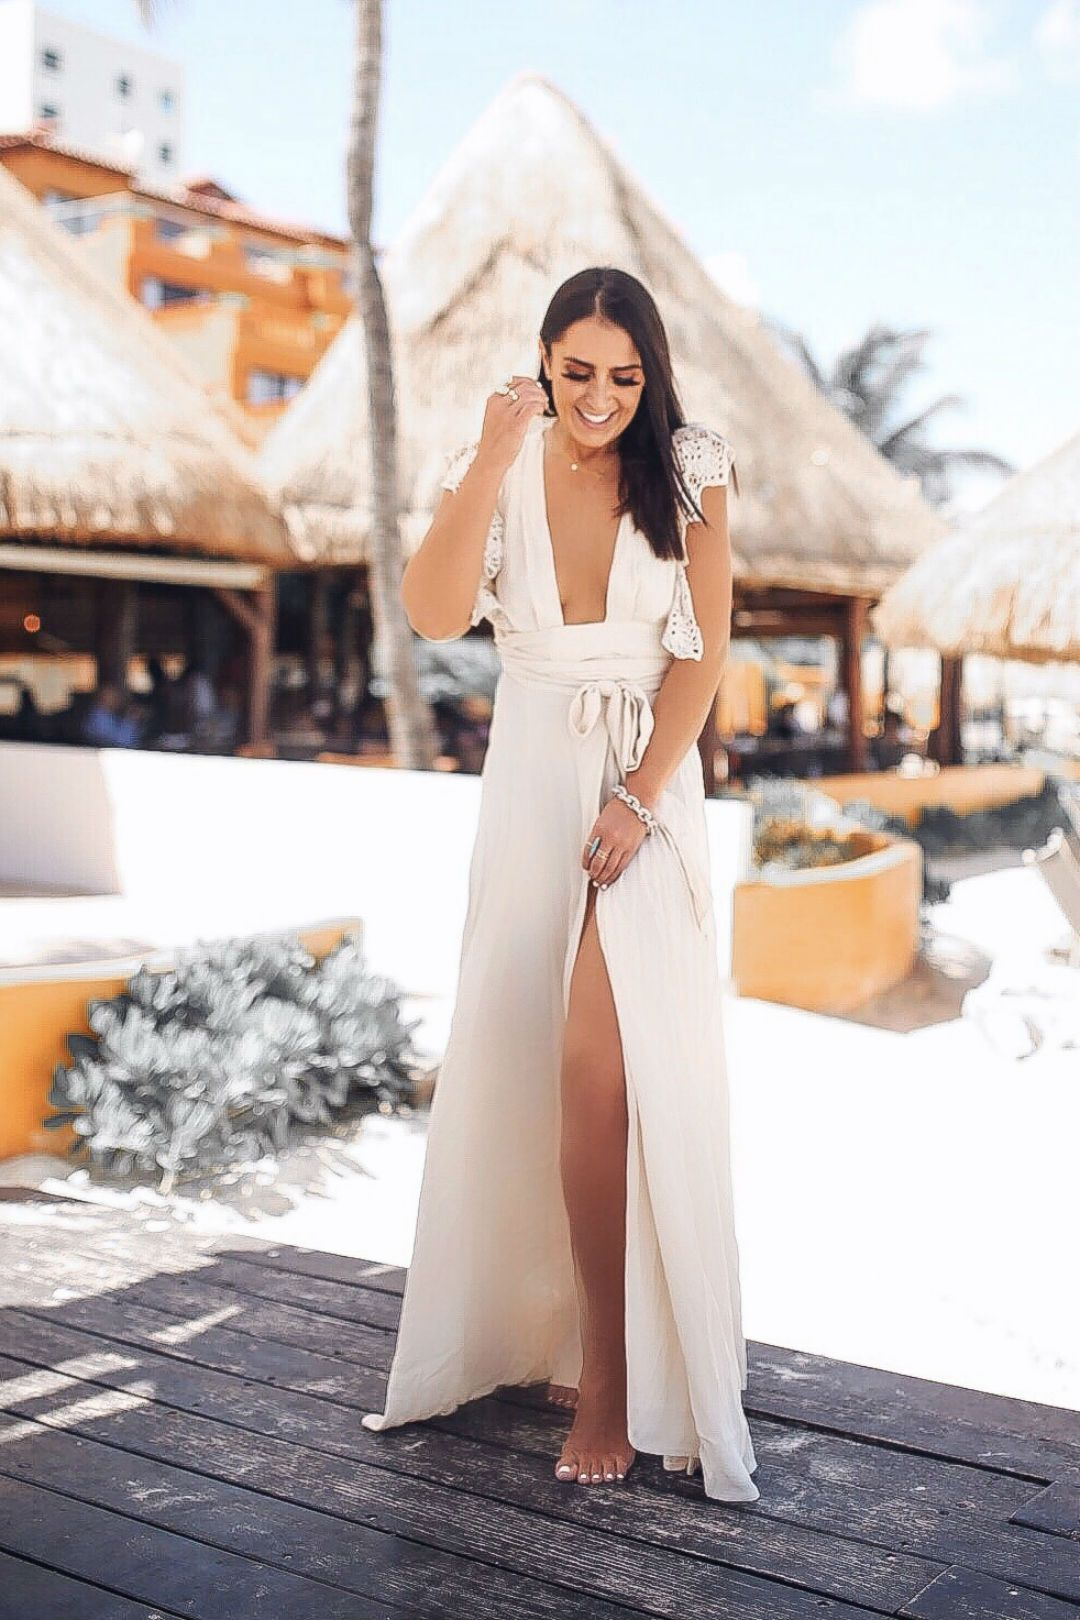 Guest of wedding dresses summer  Instagram Maxi Dress RoundUp  Dress to Impress My dream closet